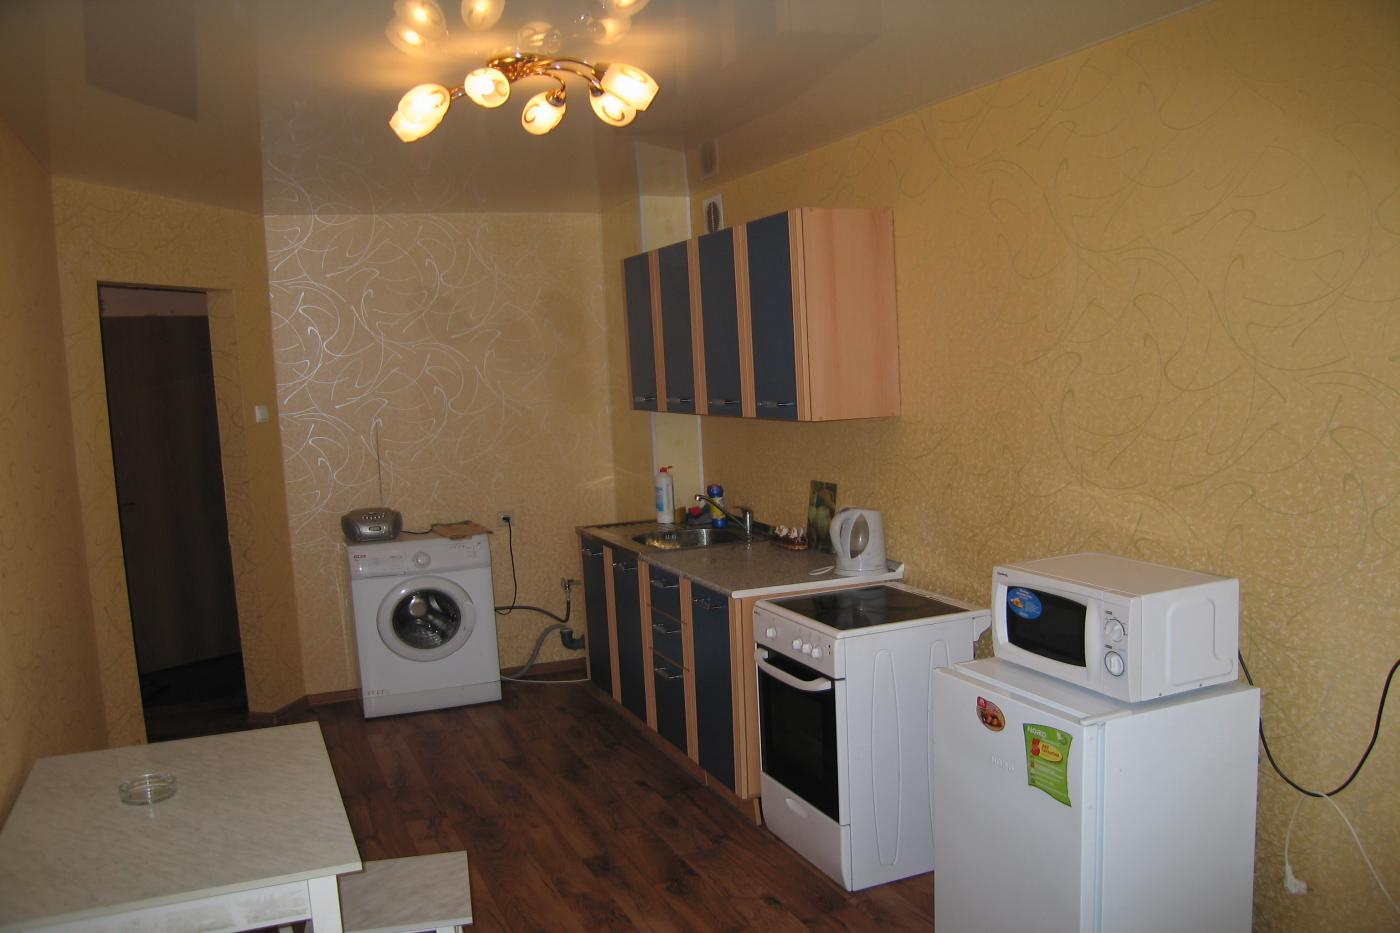 2-комнатная квартира посуточно (вариант № 2606), ул. Антонова-Овсеенко улица, фото № 5